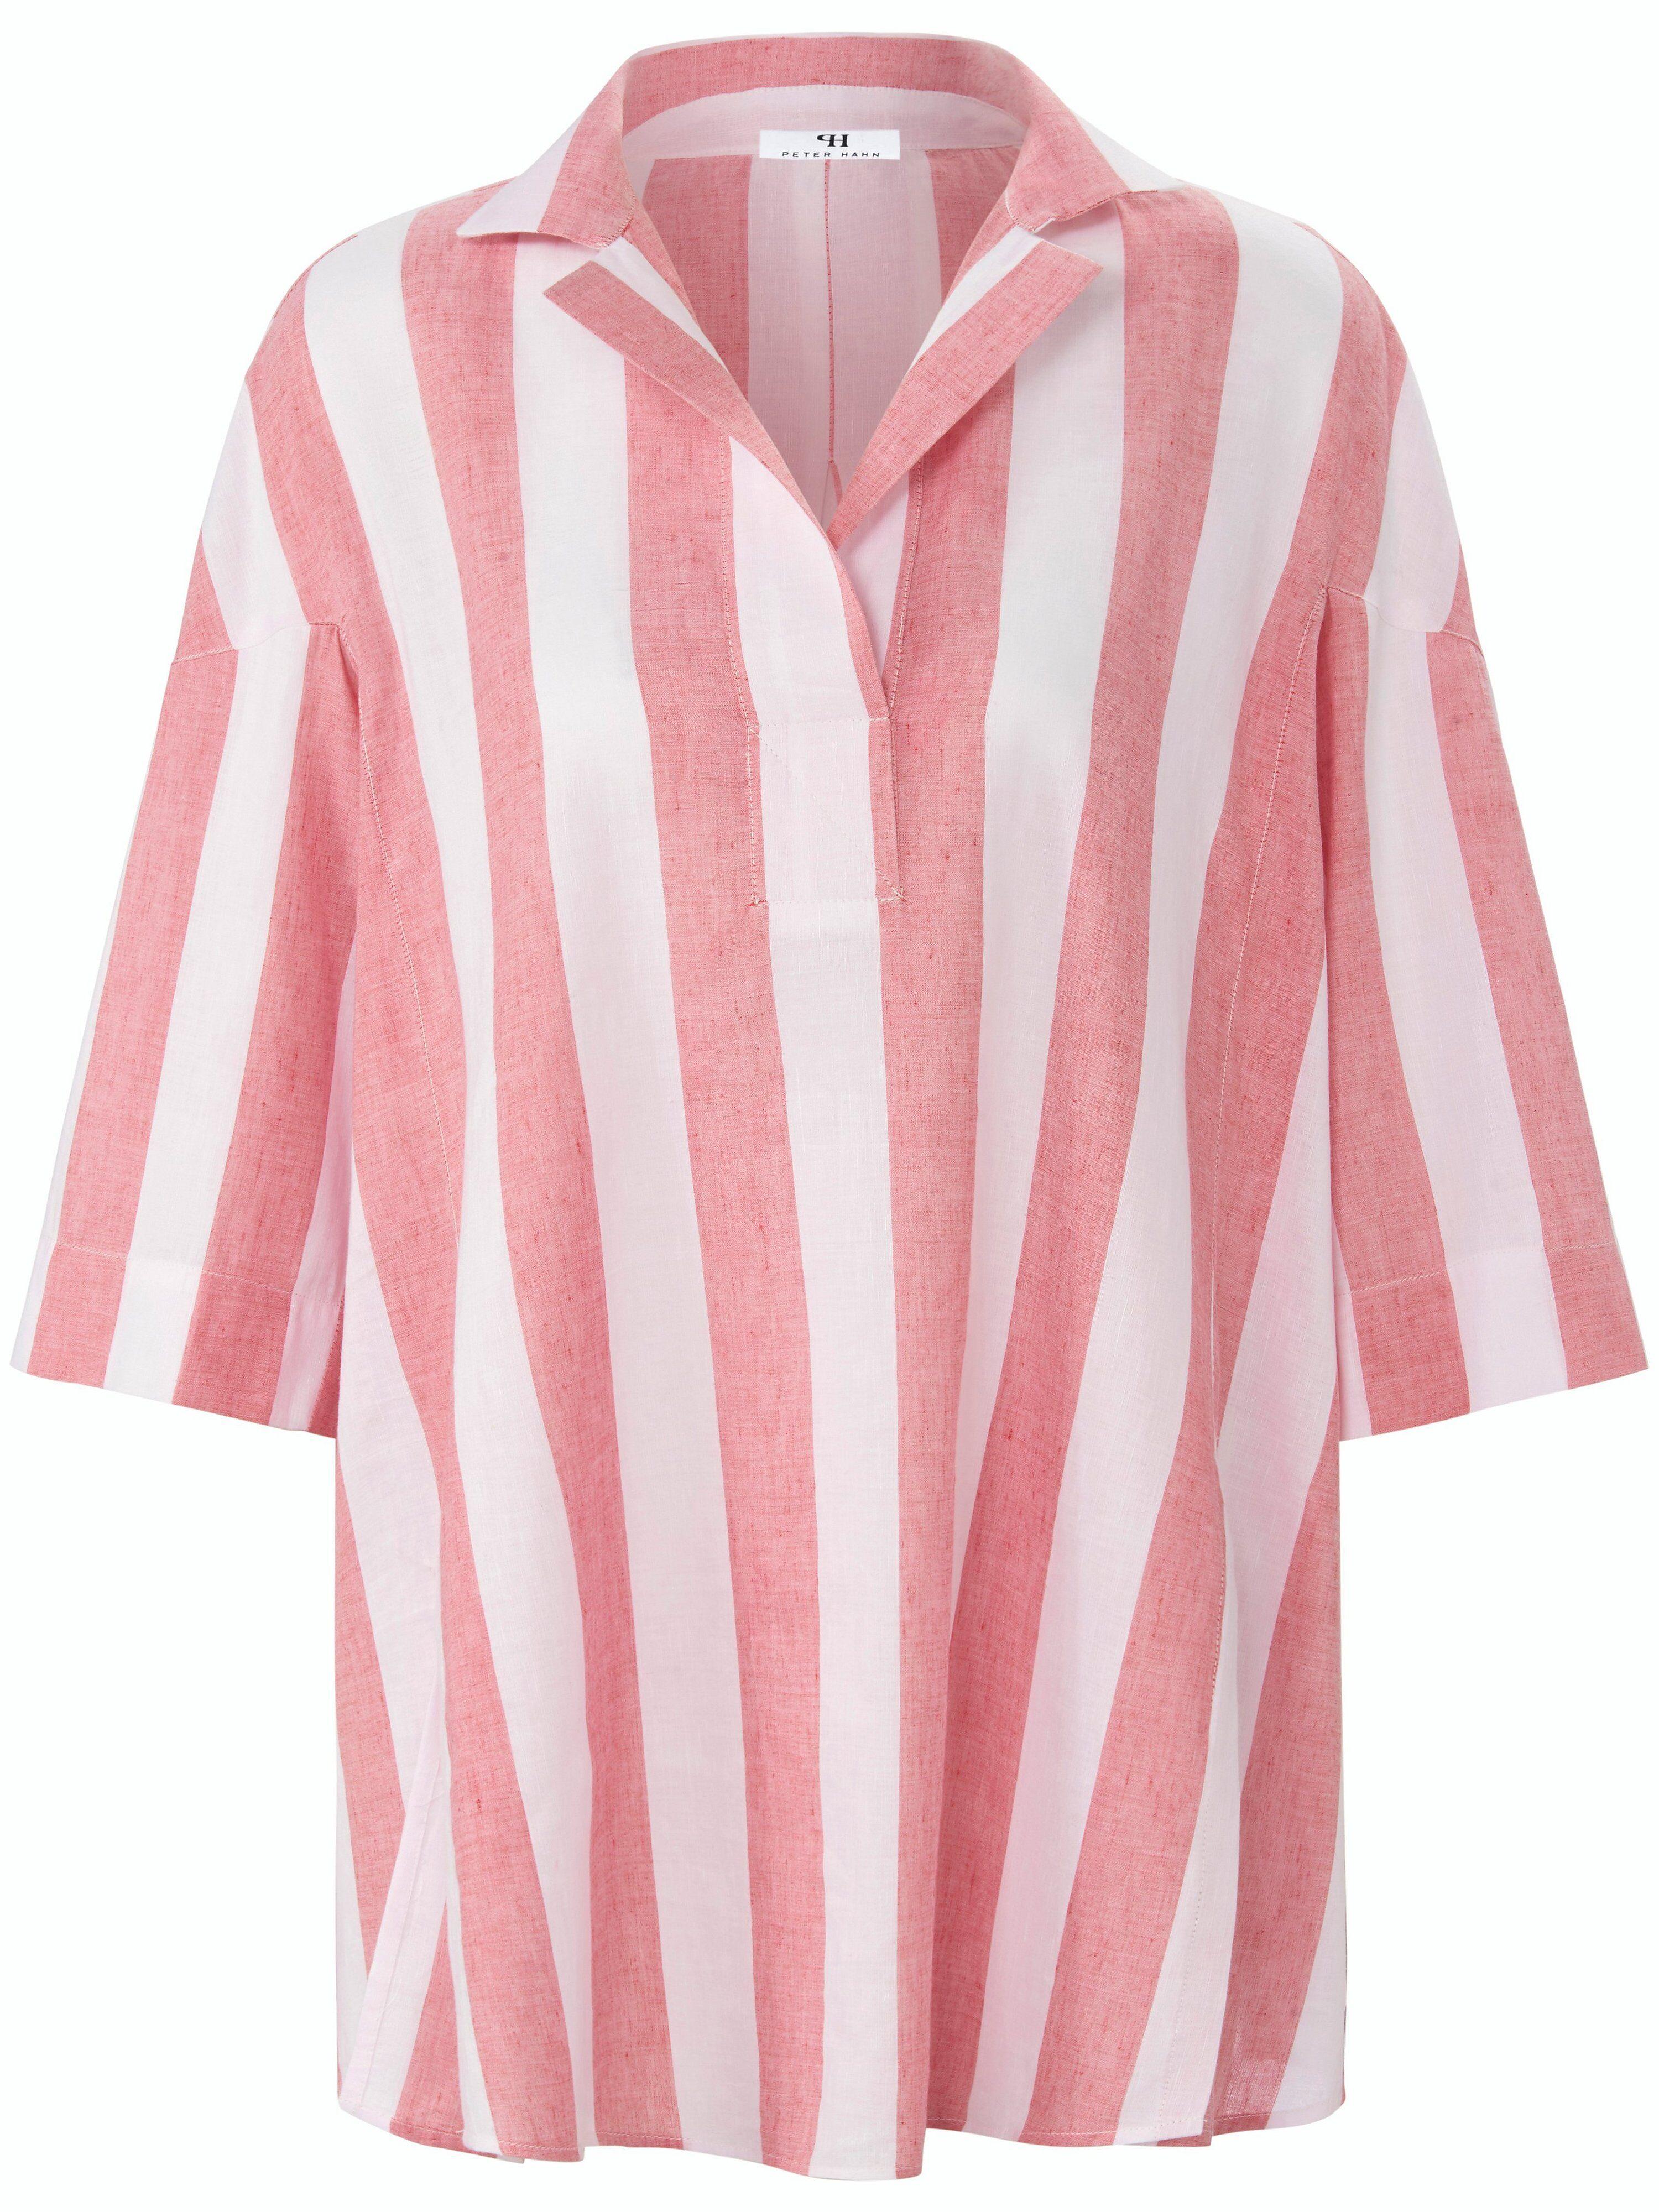 DAY.LIKE Le blouse ligne en A  DAY.LIKE blanc  - Femme - 38